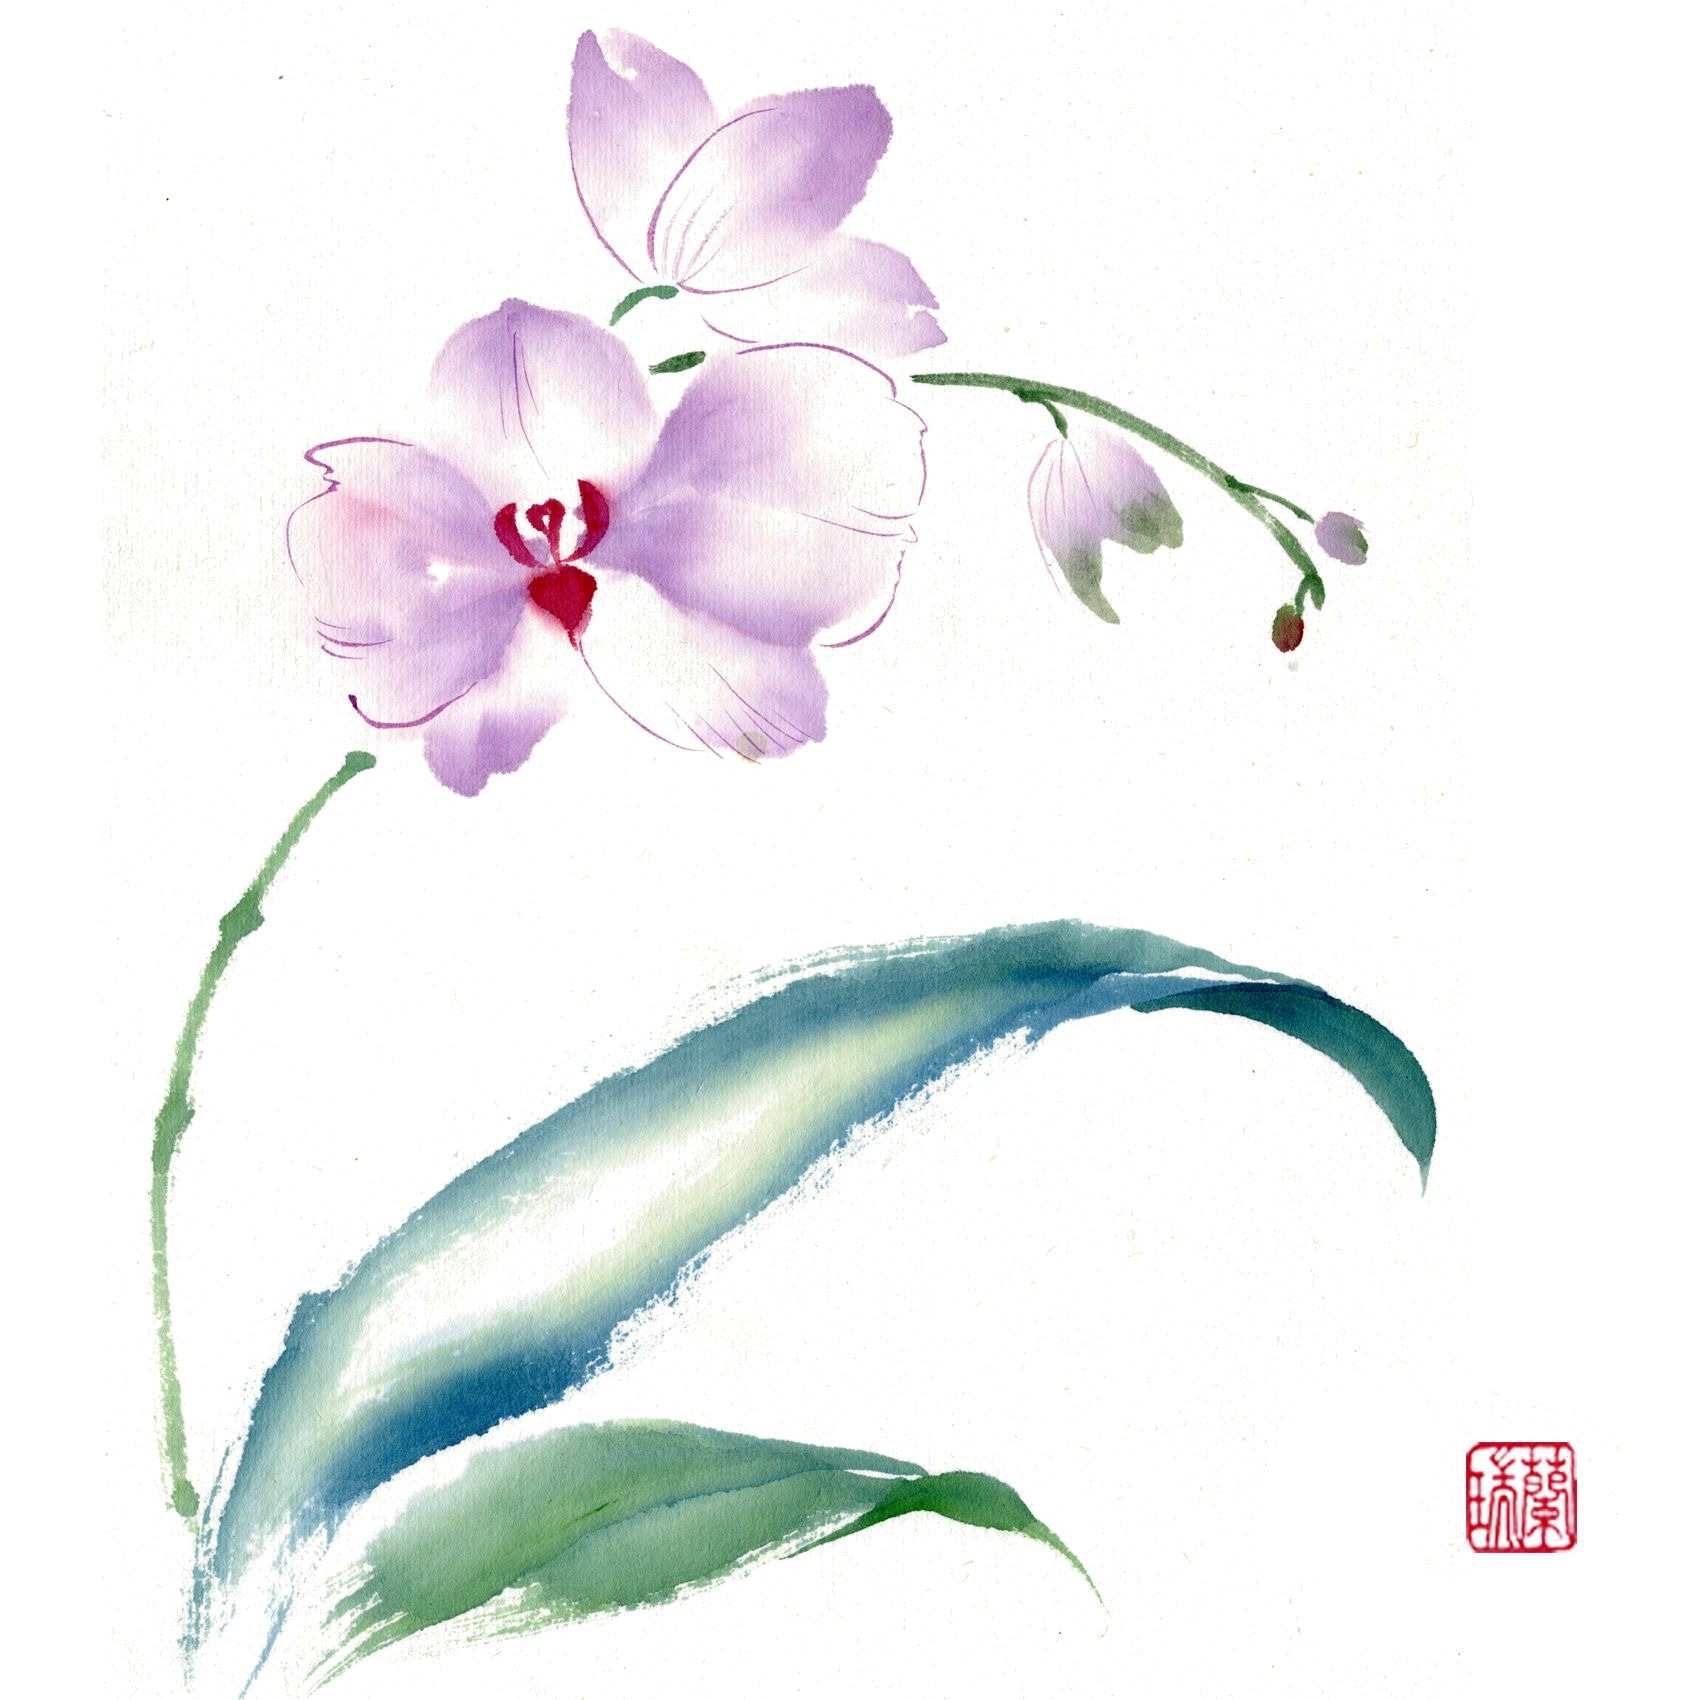 Brush Painting Phalaenopsis Orchids Gentle Whisper By Nan Rae Orchids Painting Chinese Painting Flowers Flower Painting